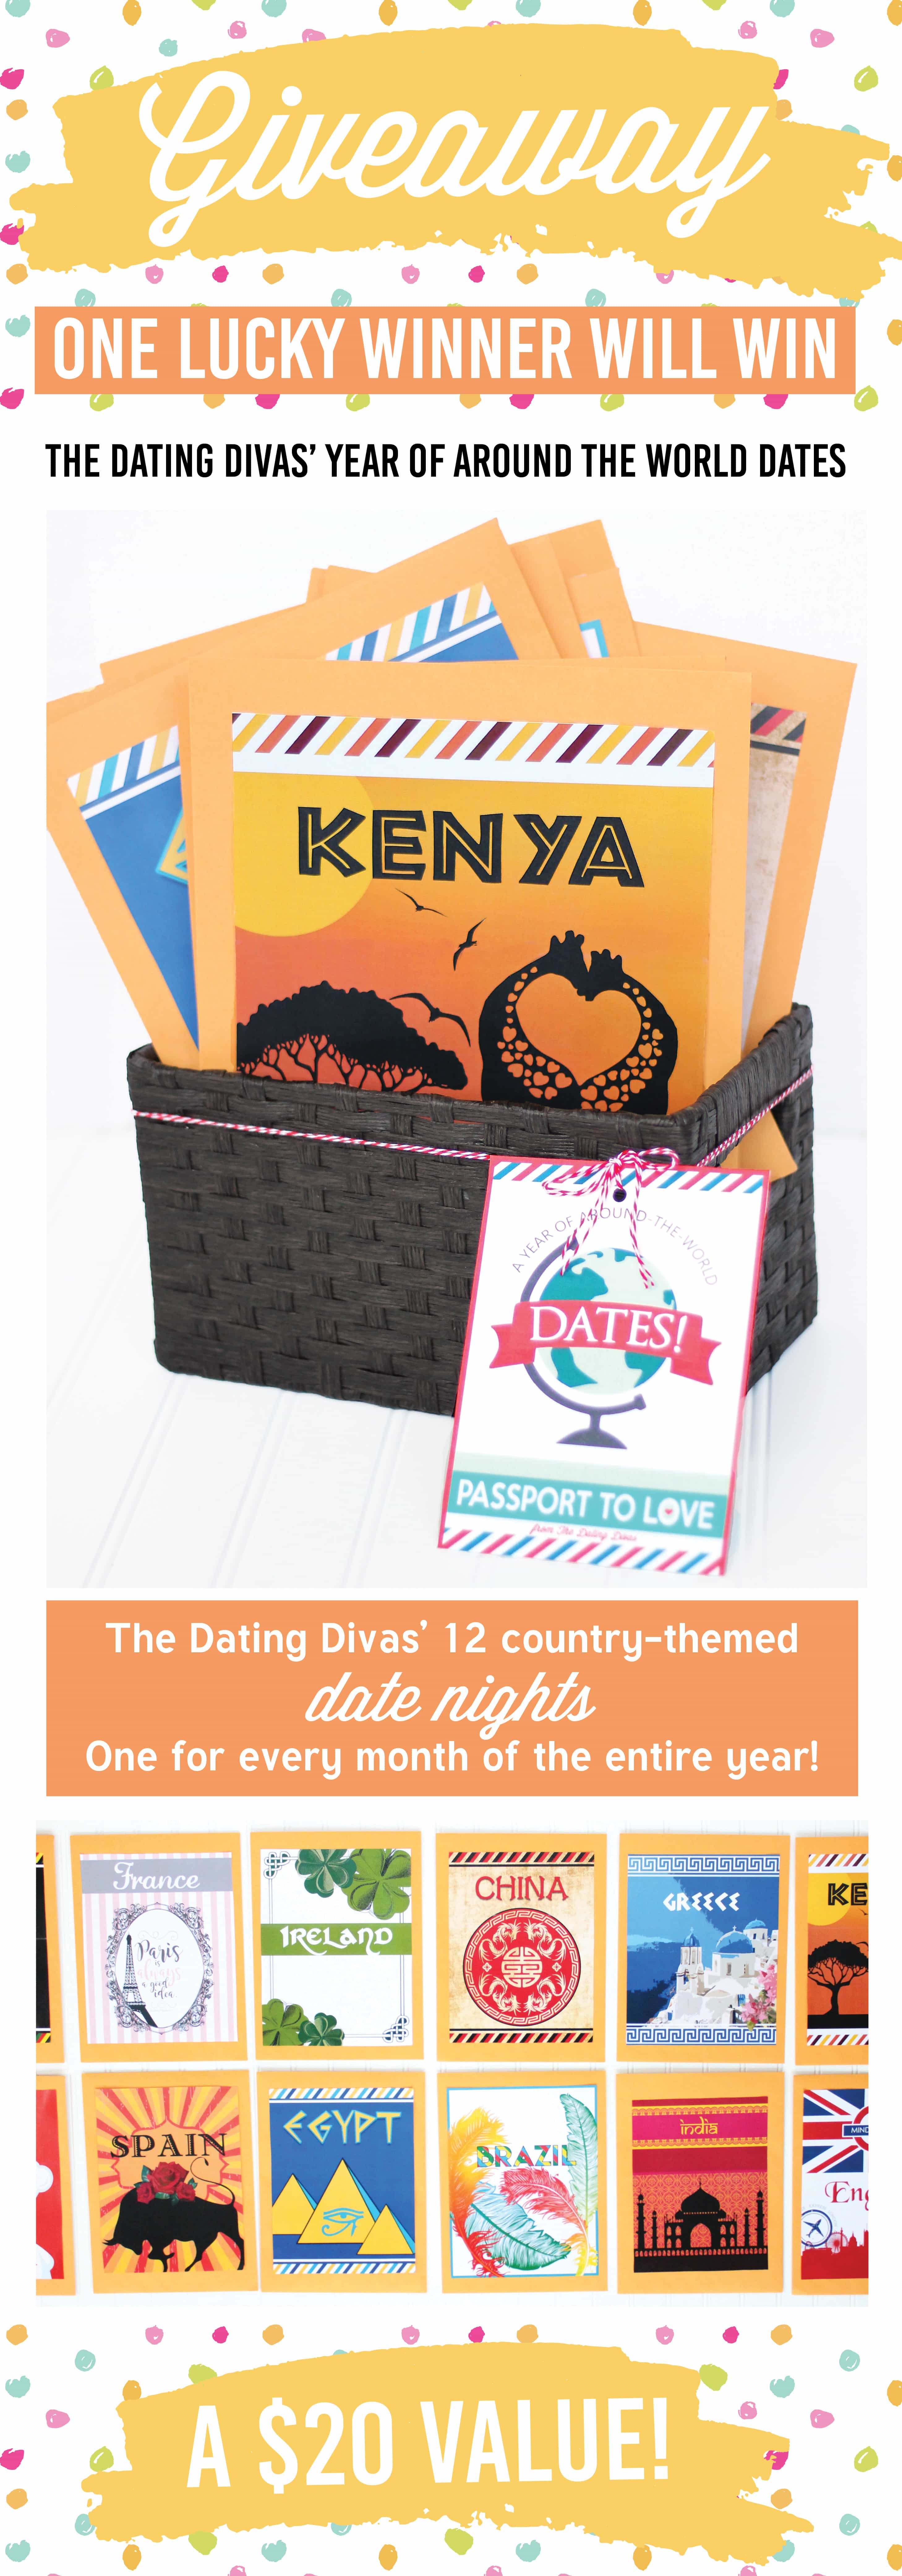 The dating divas passport to love